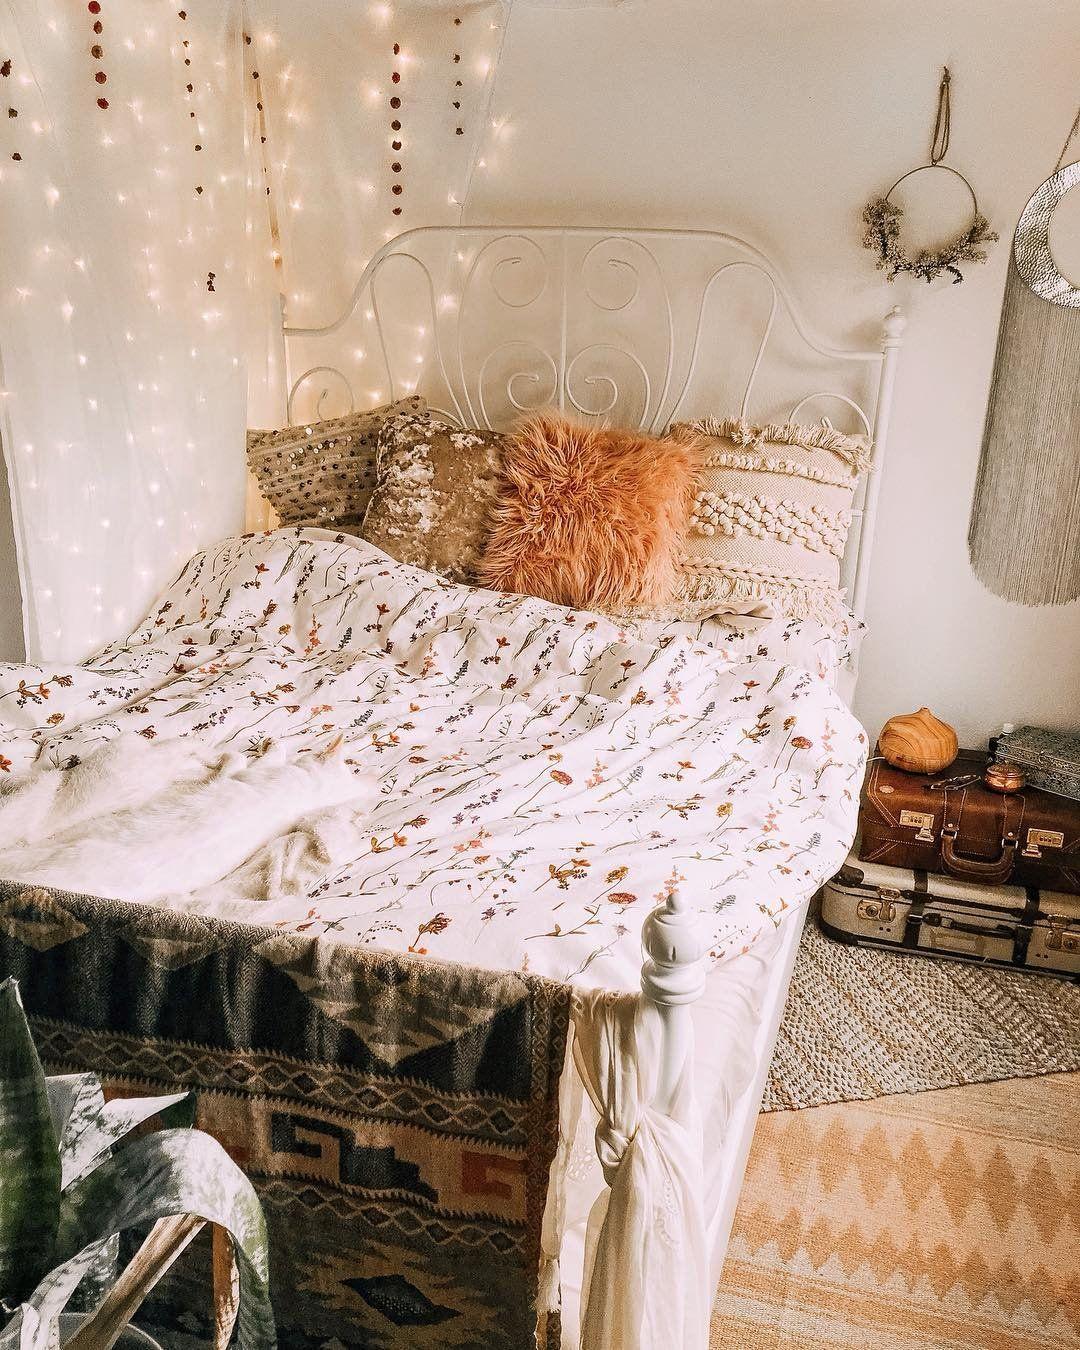 Pressed Flowers Duvet Cover Set Aesthetic bedroom